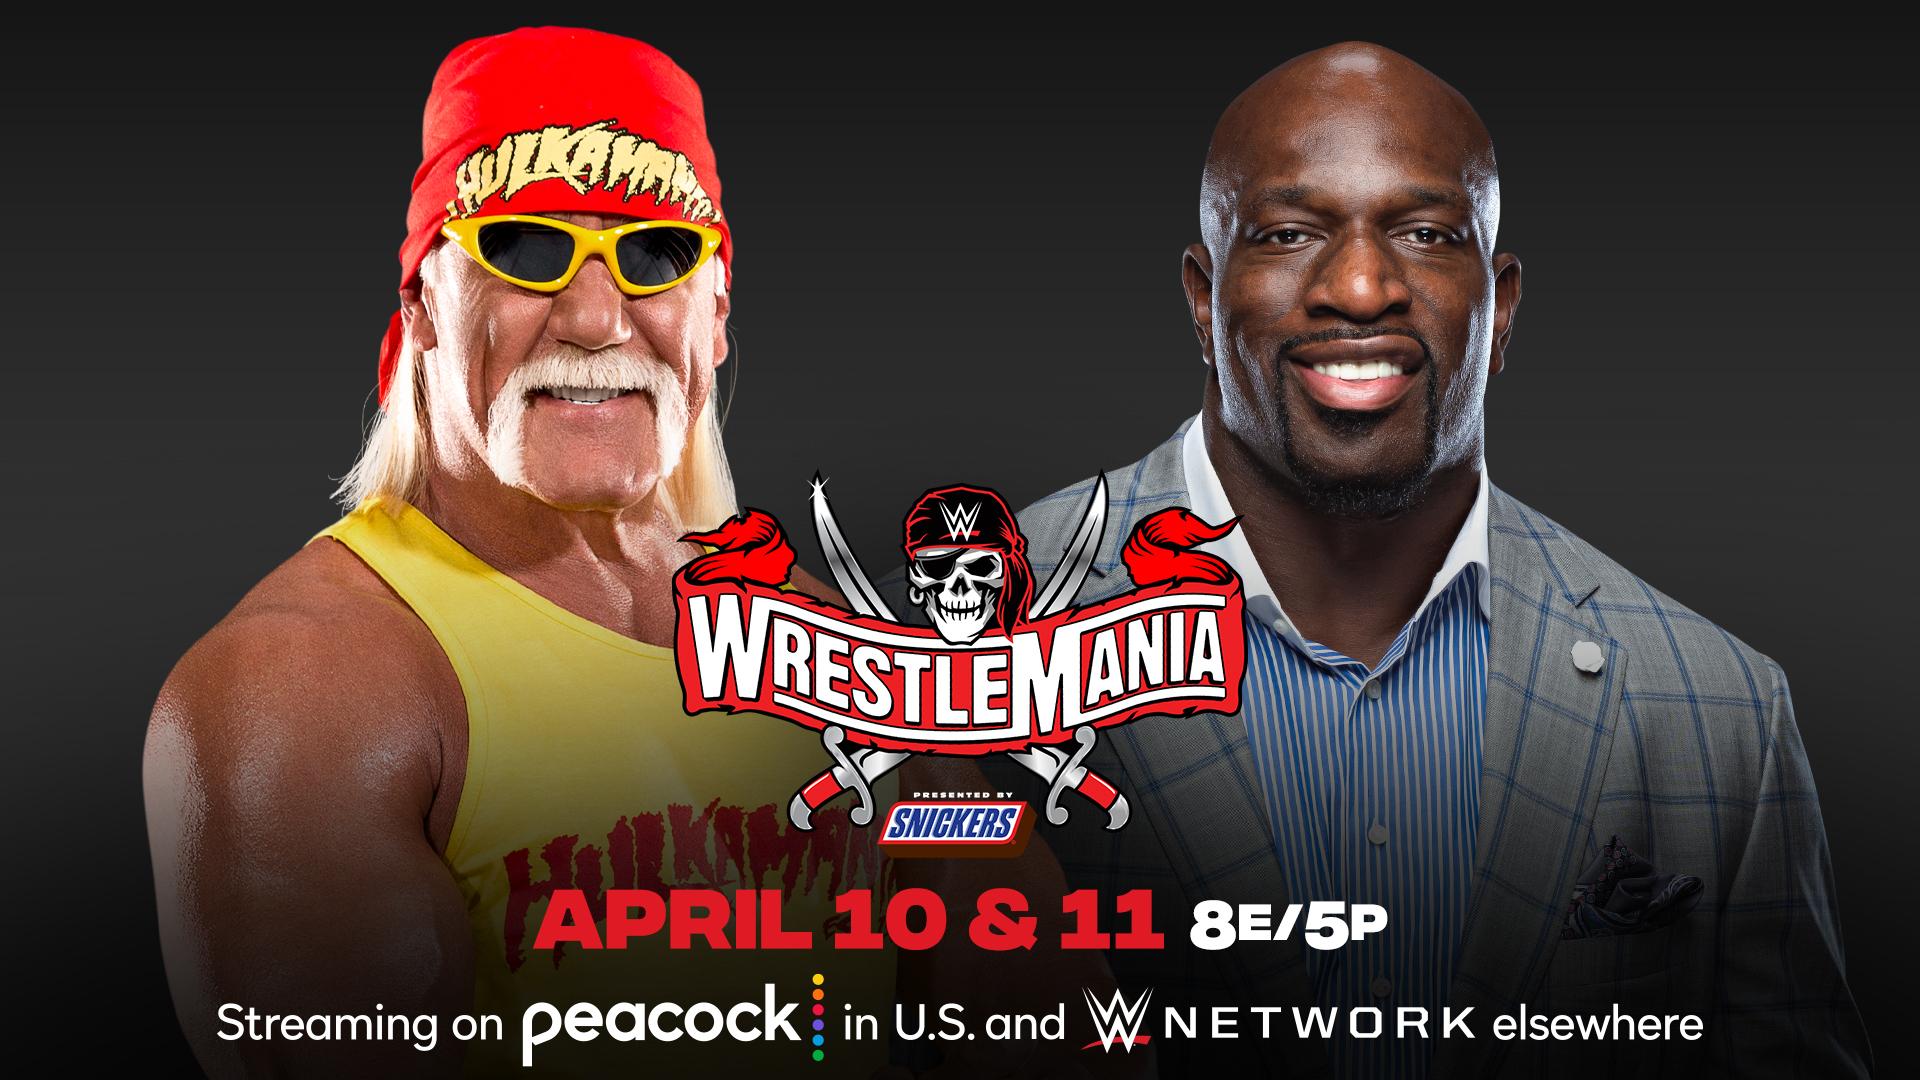 Hulk Hogan® and Titus O'Neil® to Host WrestleMania®   Business Wire